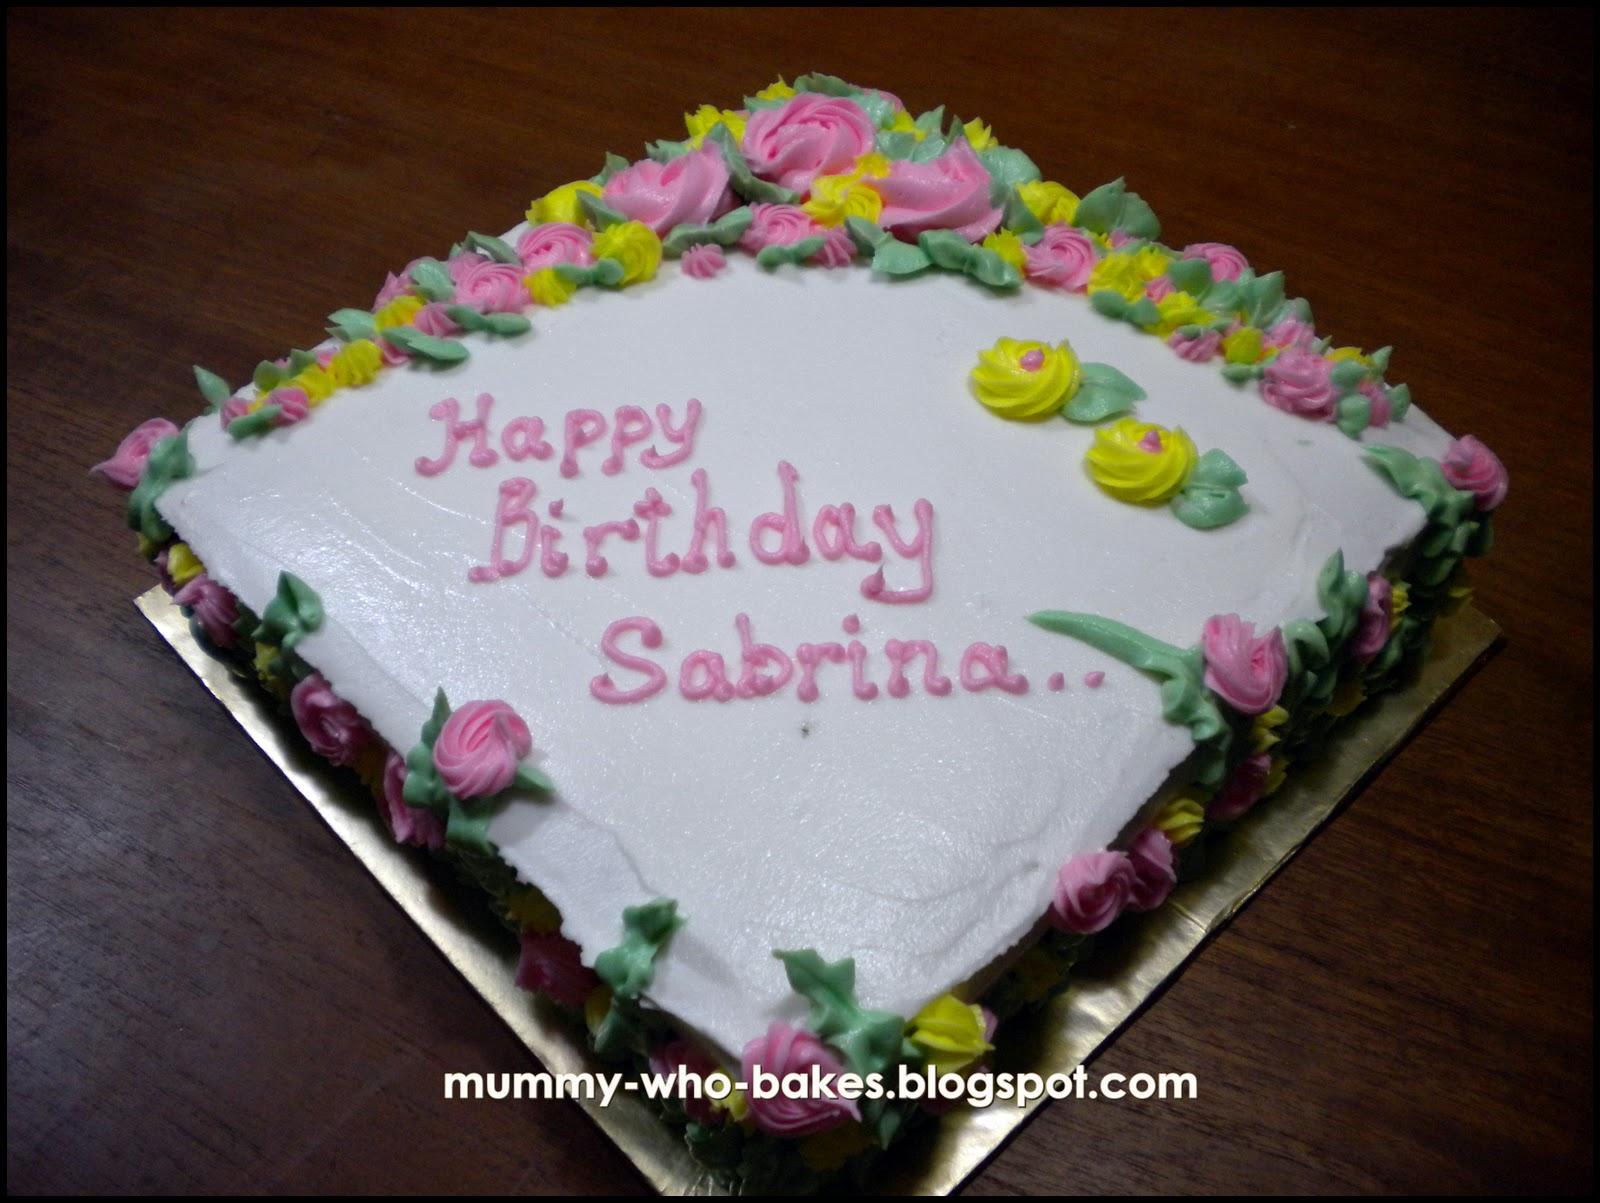 Happy Birthday Sabrina Cake Images